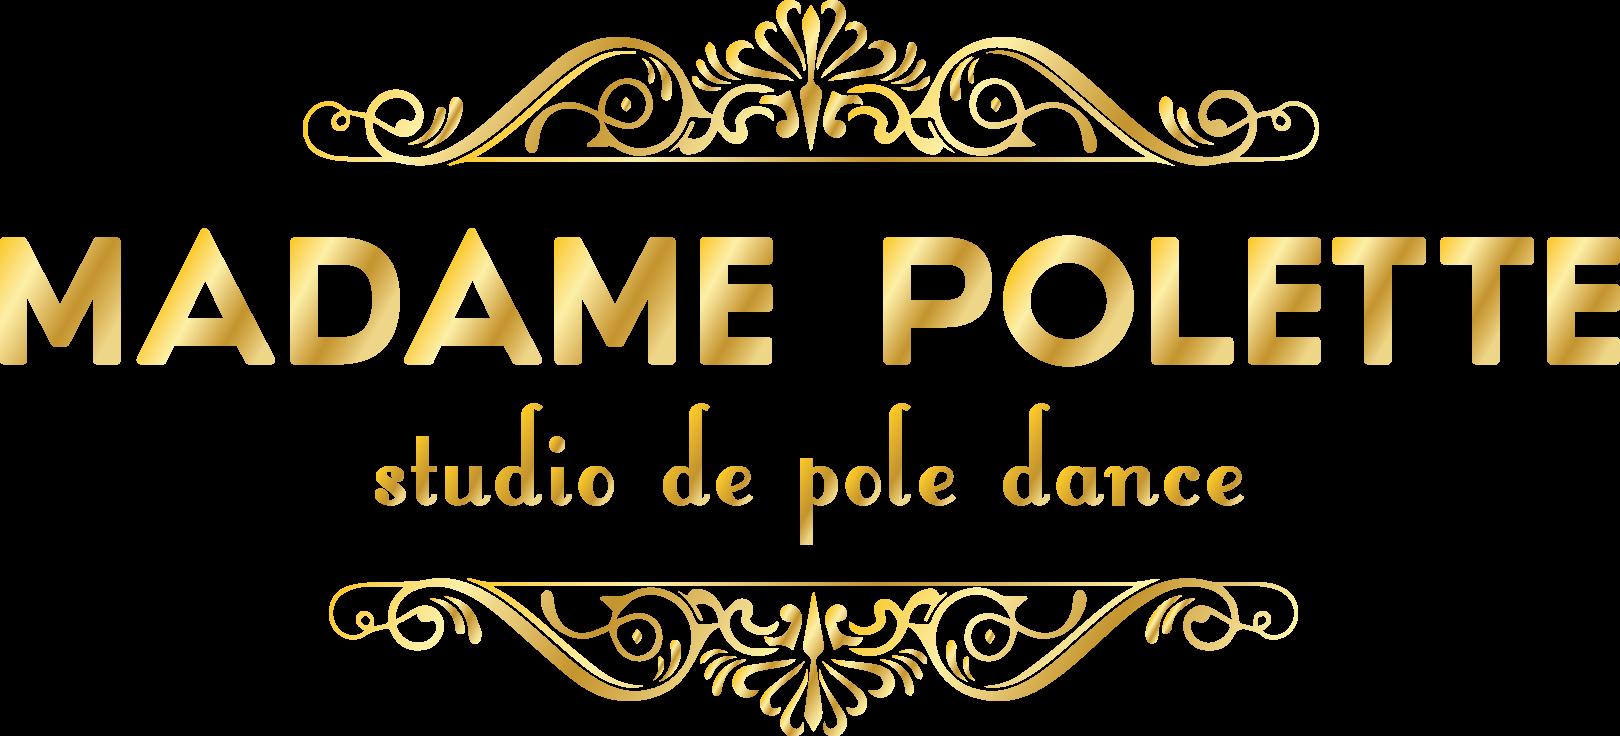 Madame Polette